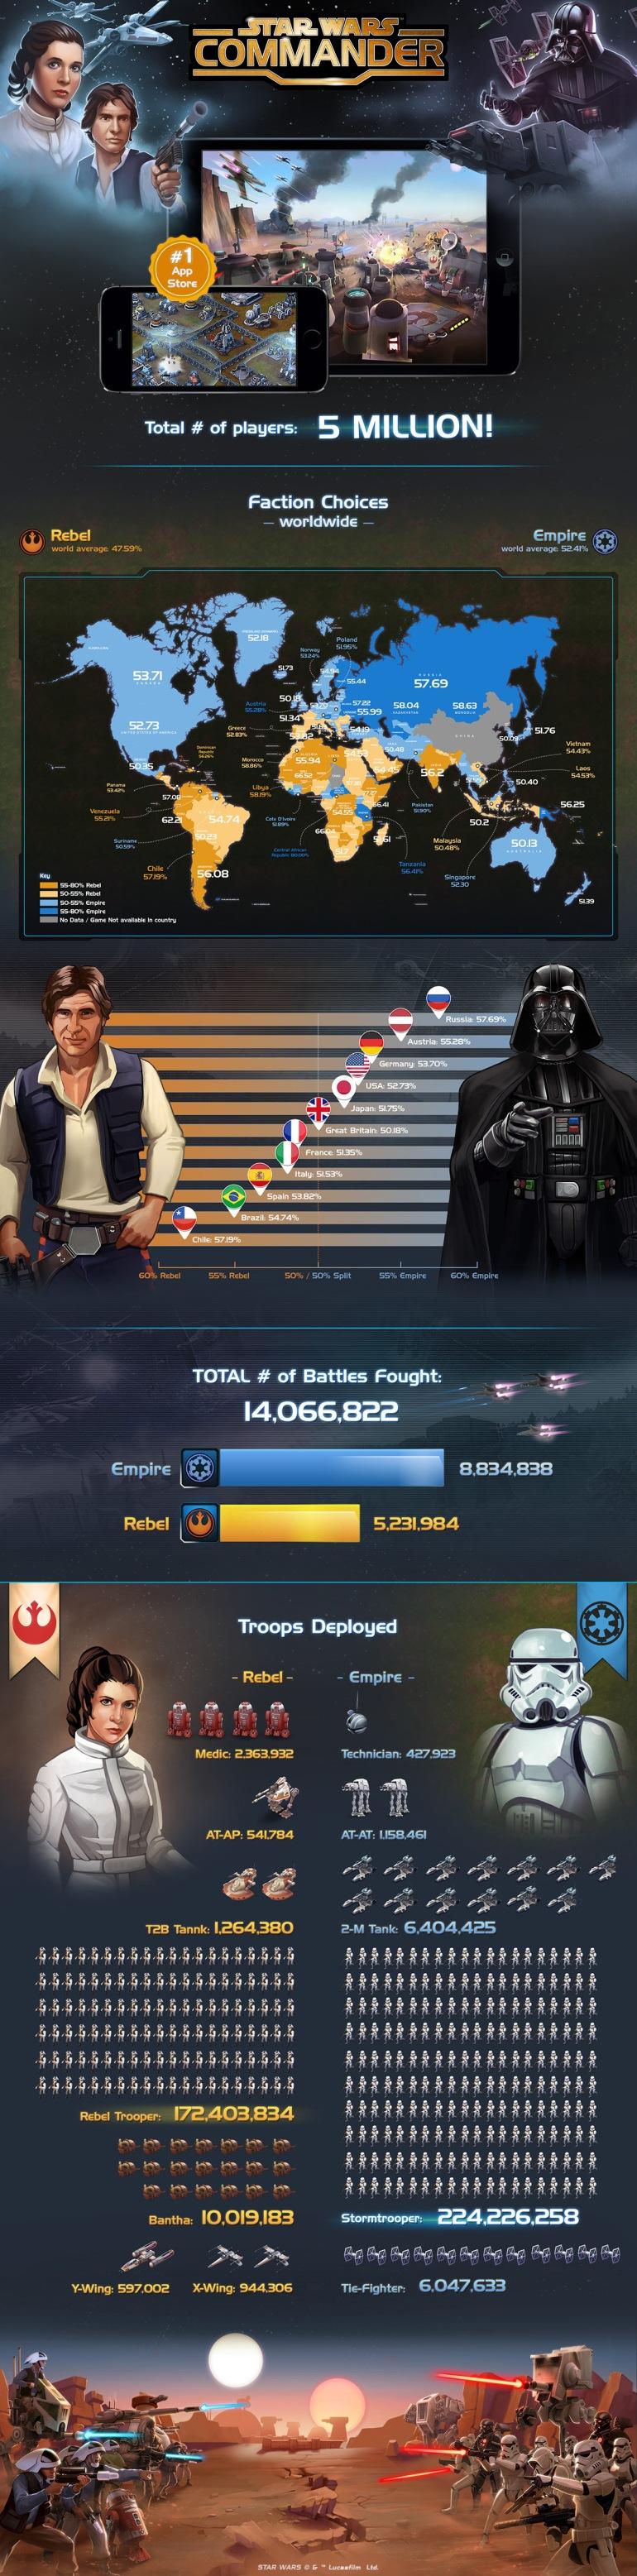 Star-Wars-Commander-infographic